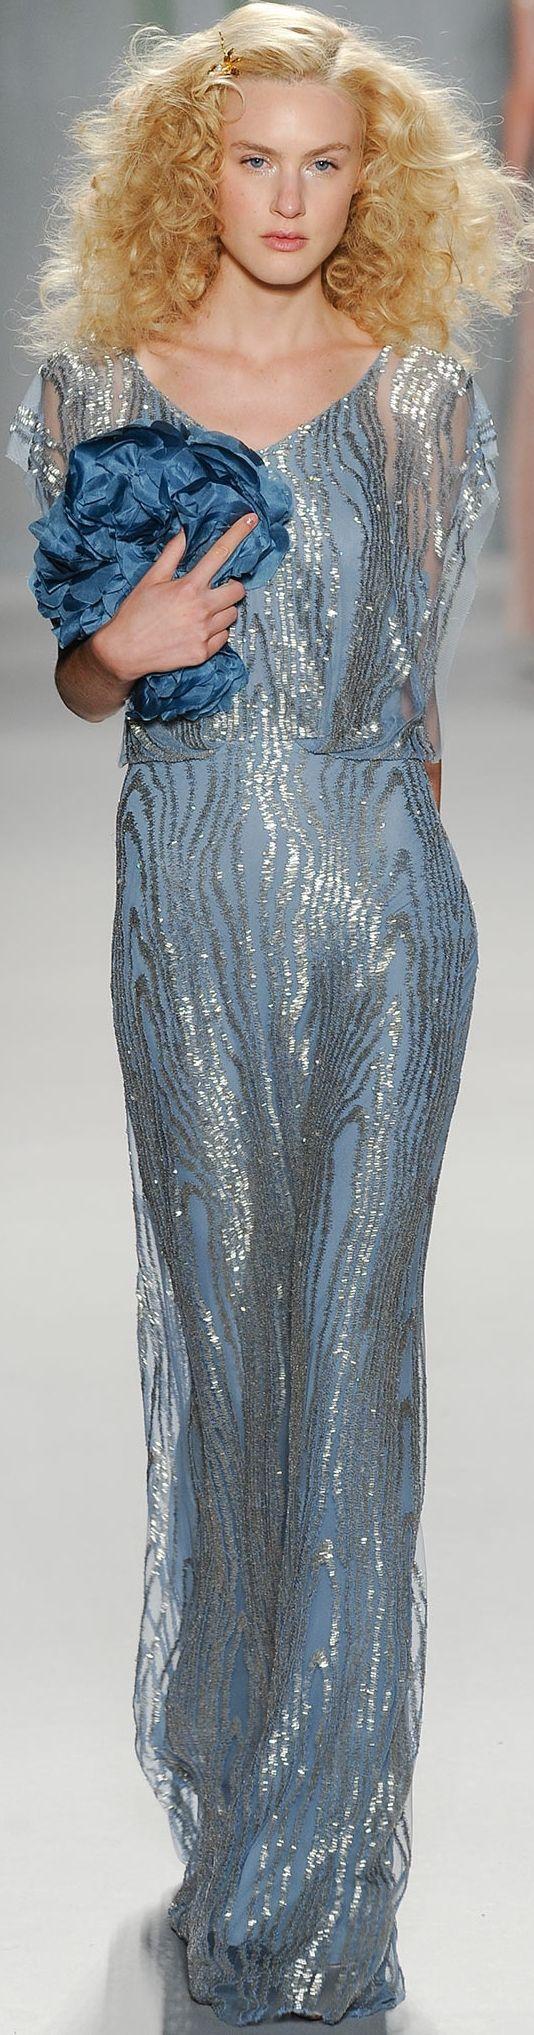 164 best Jenny Packham images on Pinterest | Homecoming dresses ...